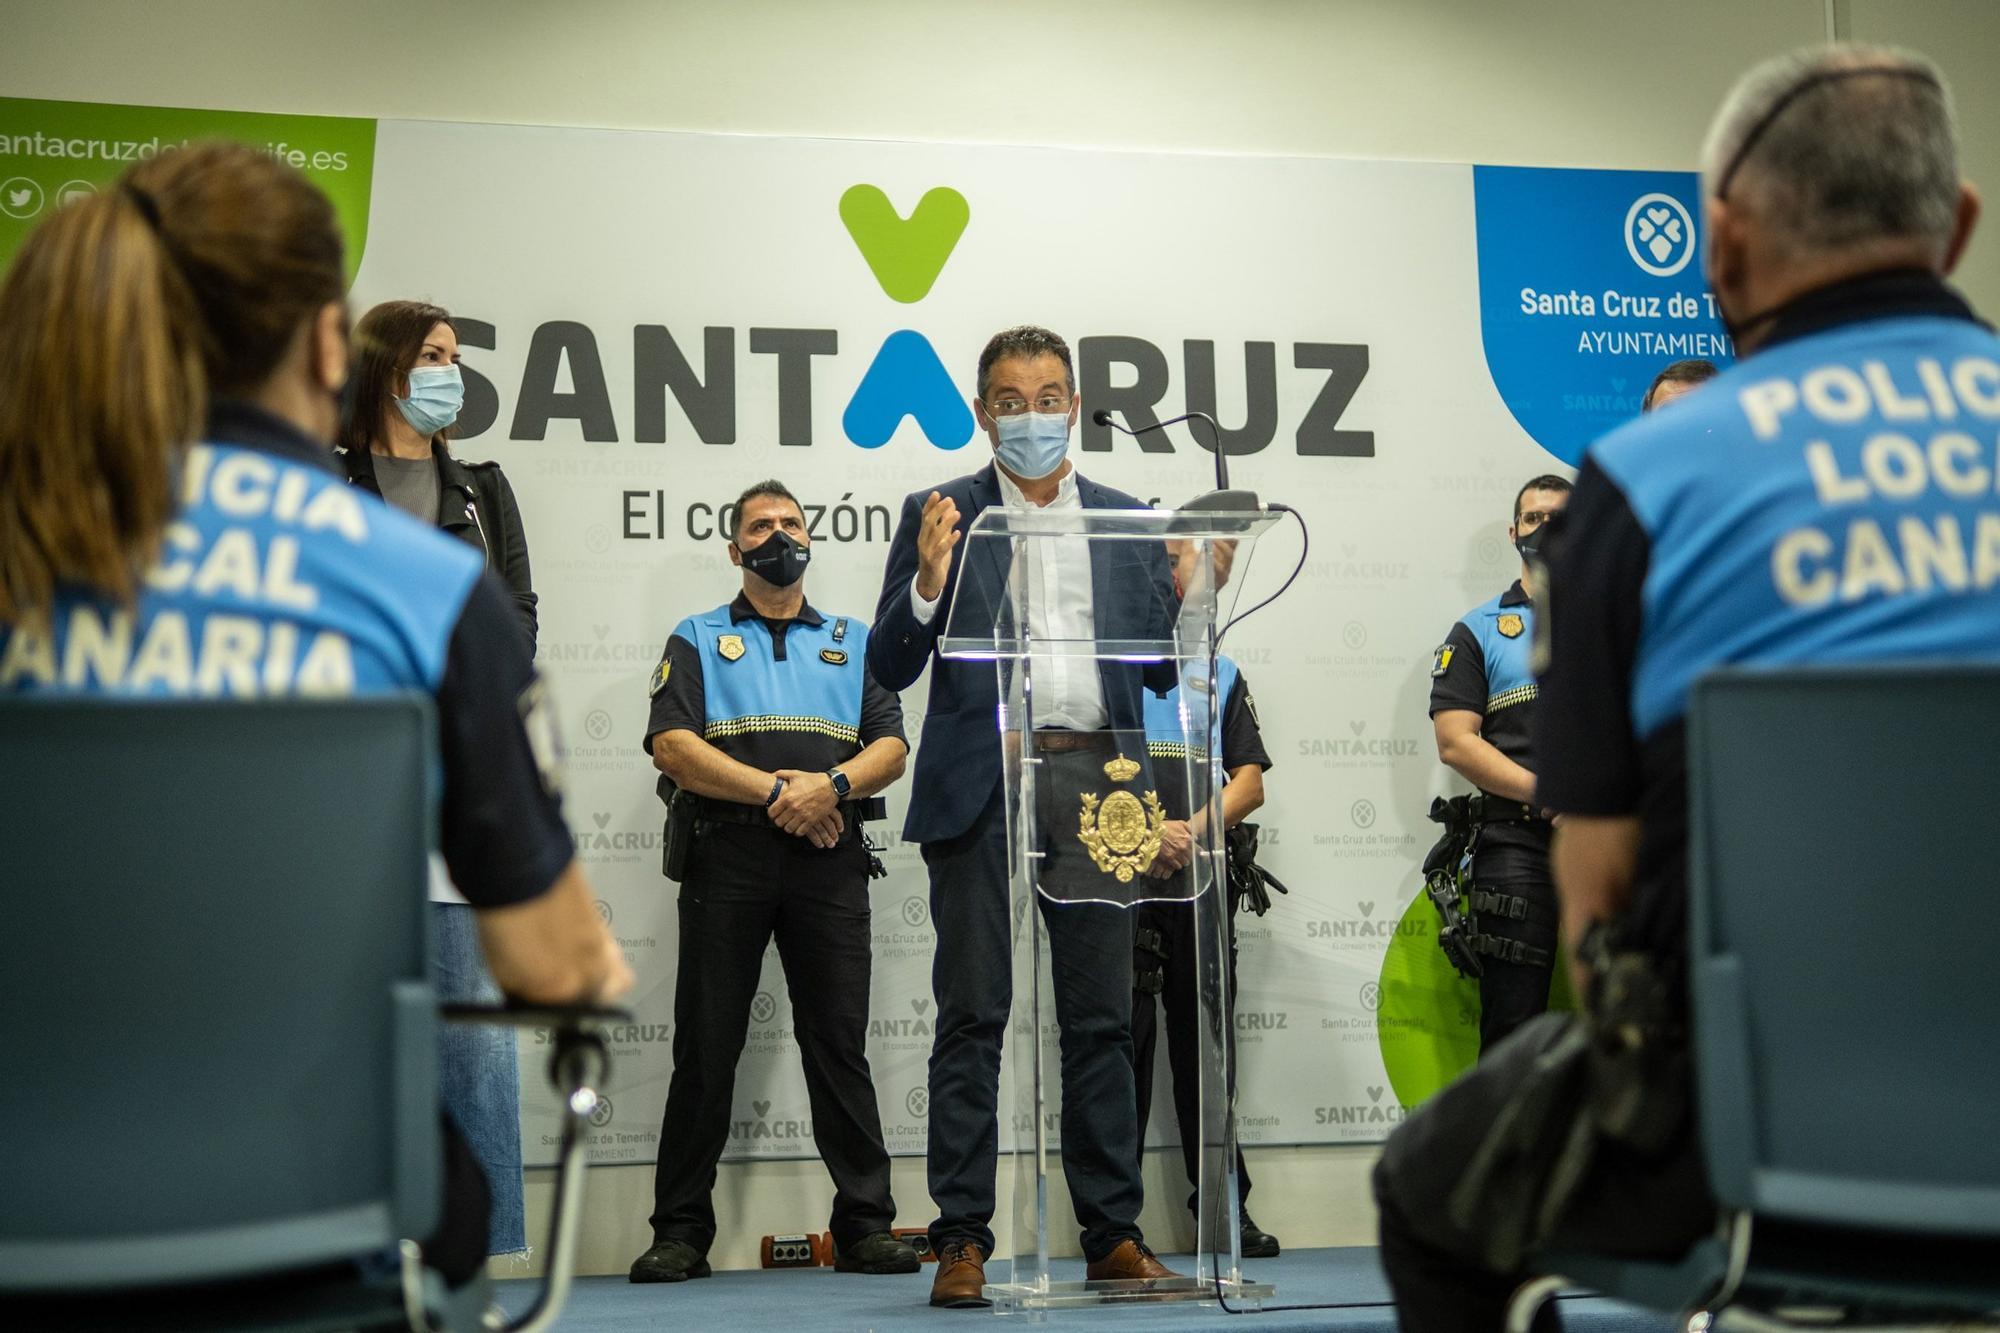 Presentación operación productos falsificados Santa Cruz